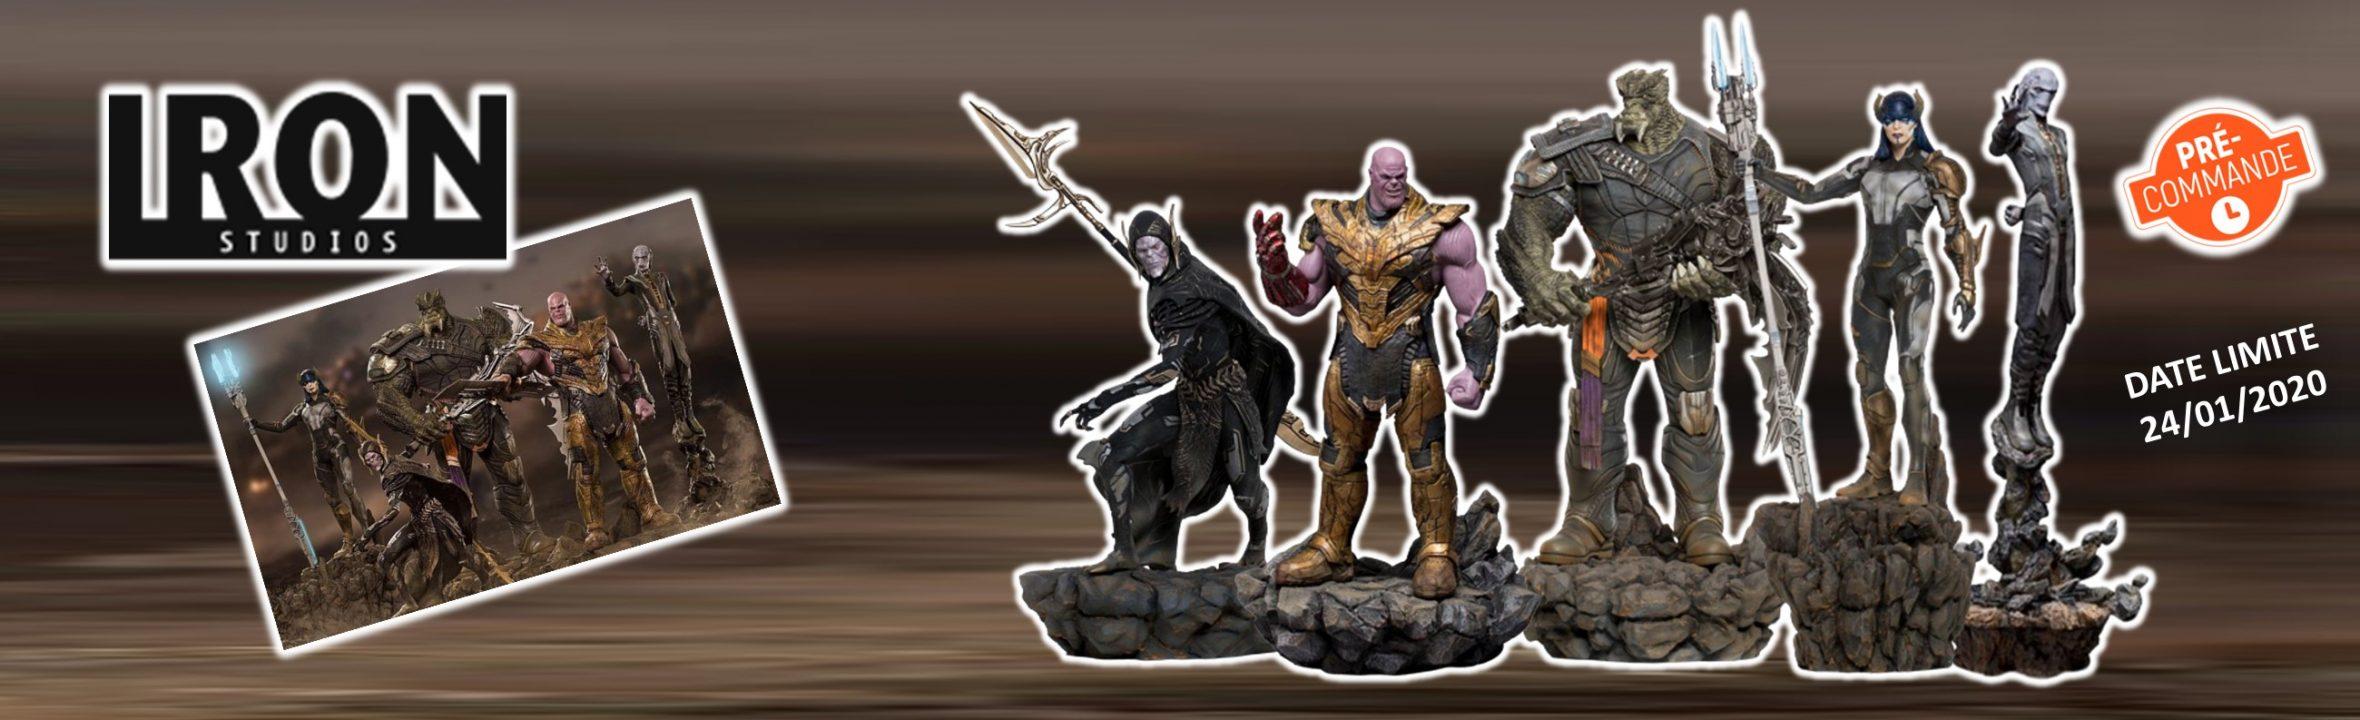 figurines résine Iron studios Avengers Endgame marvel